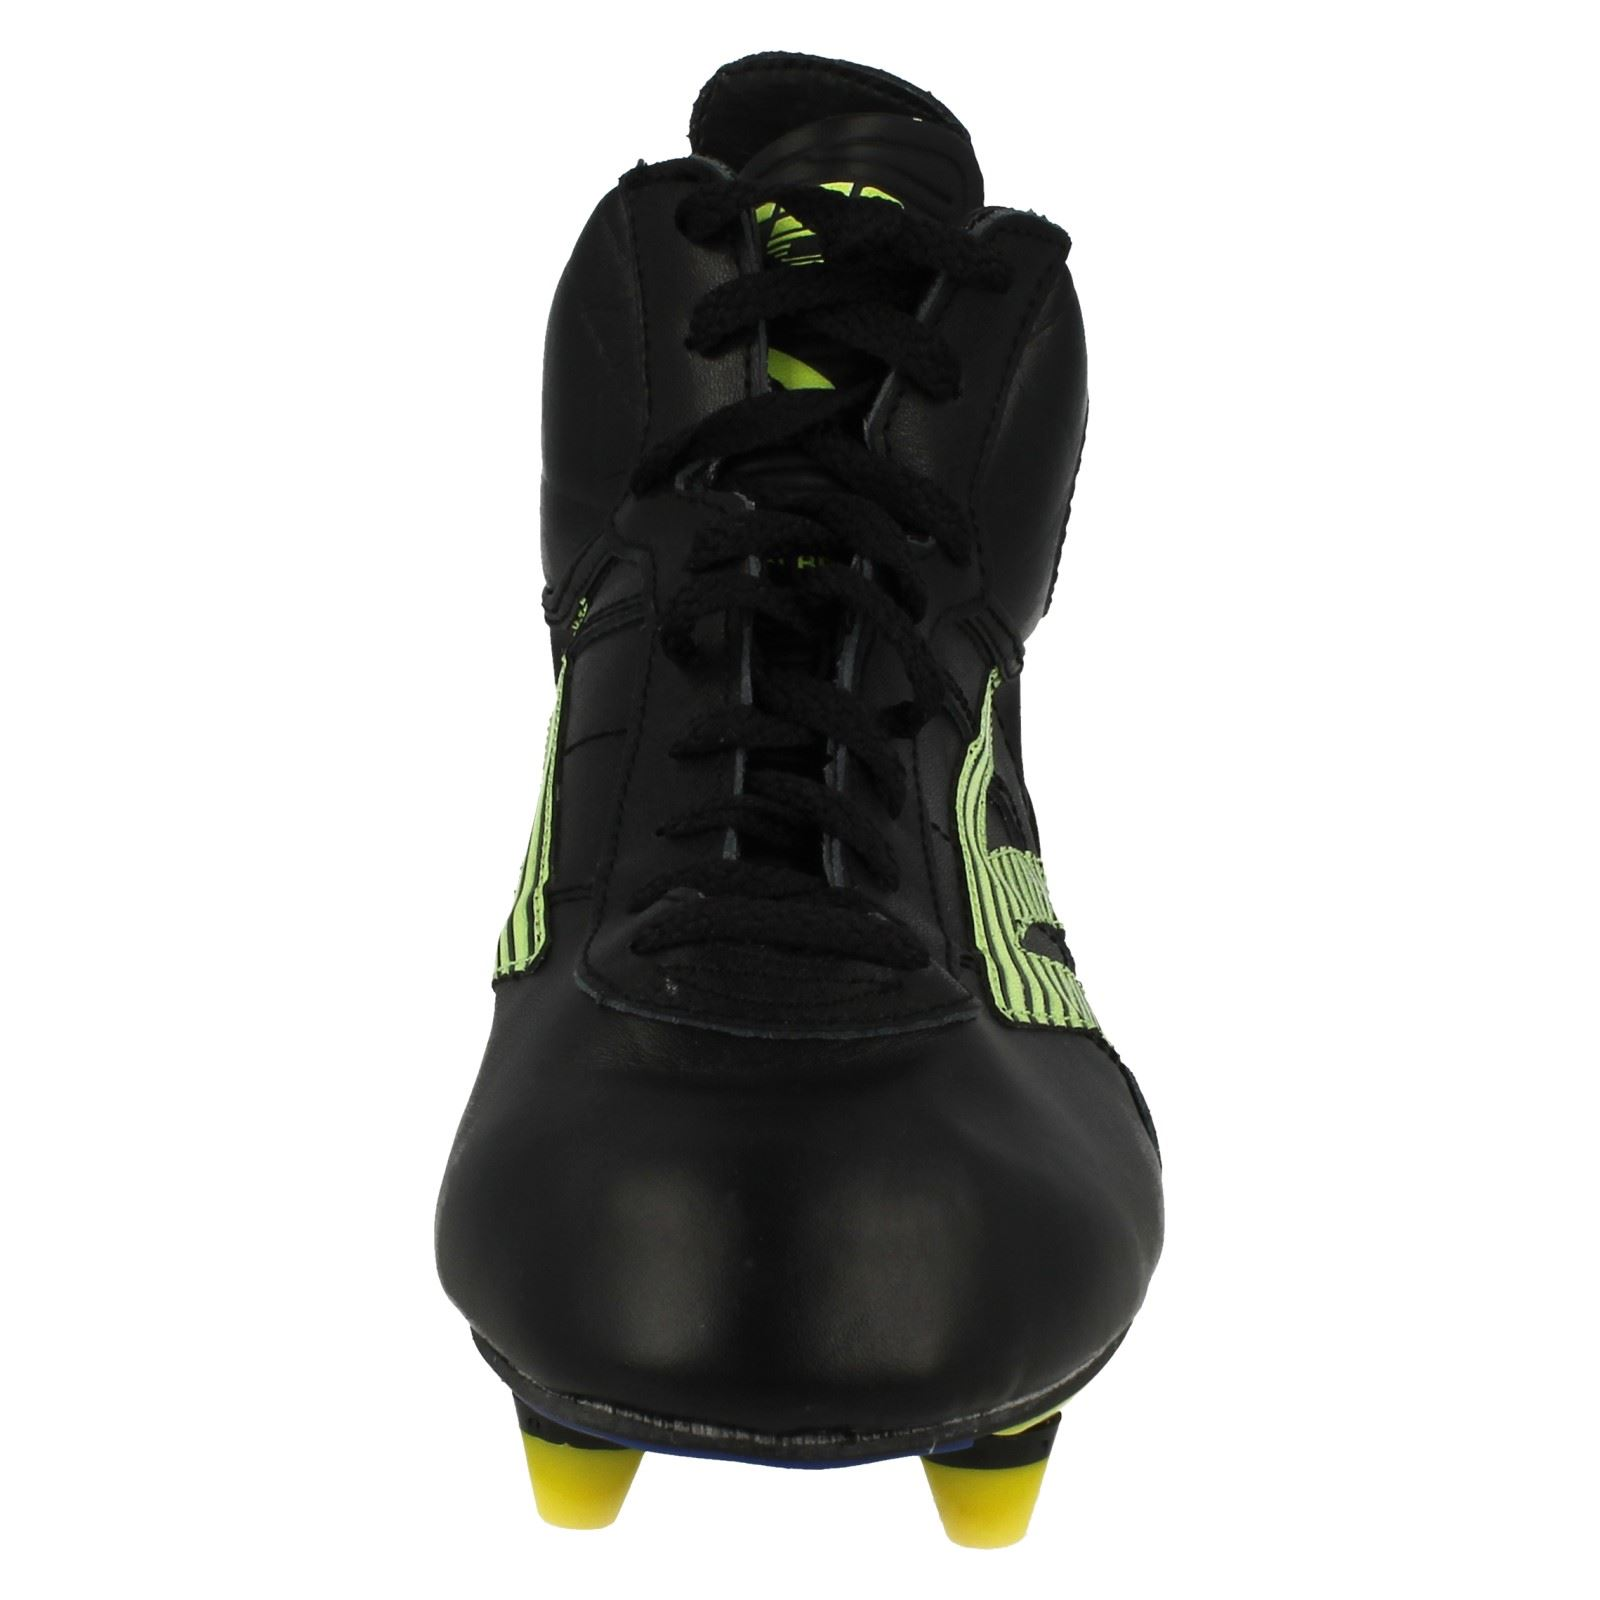 30488f1db055 Hi-Tec-Mens-Rugby-Boots-Rugby-XL thumbnail 9